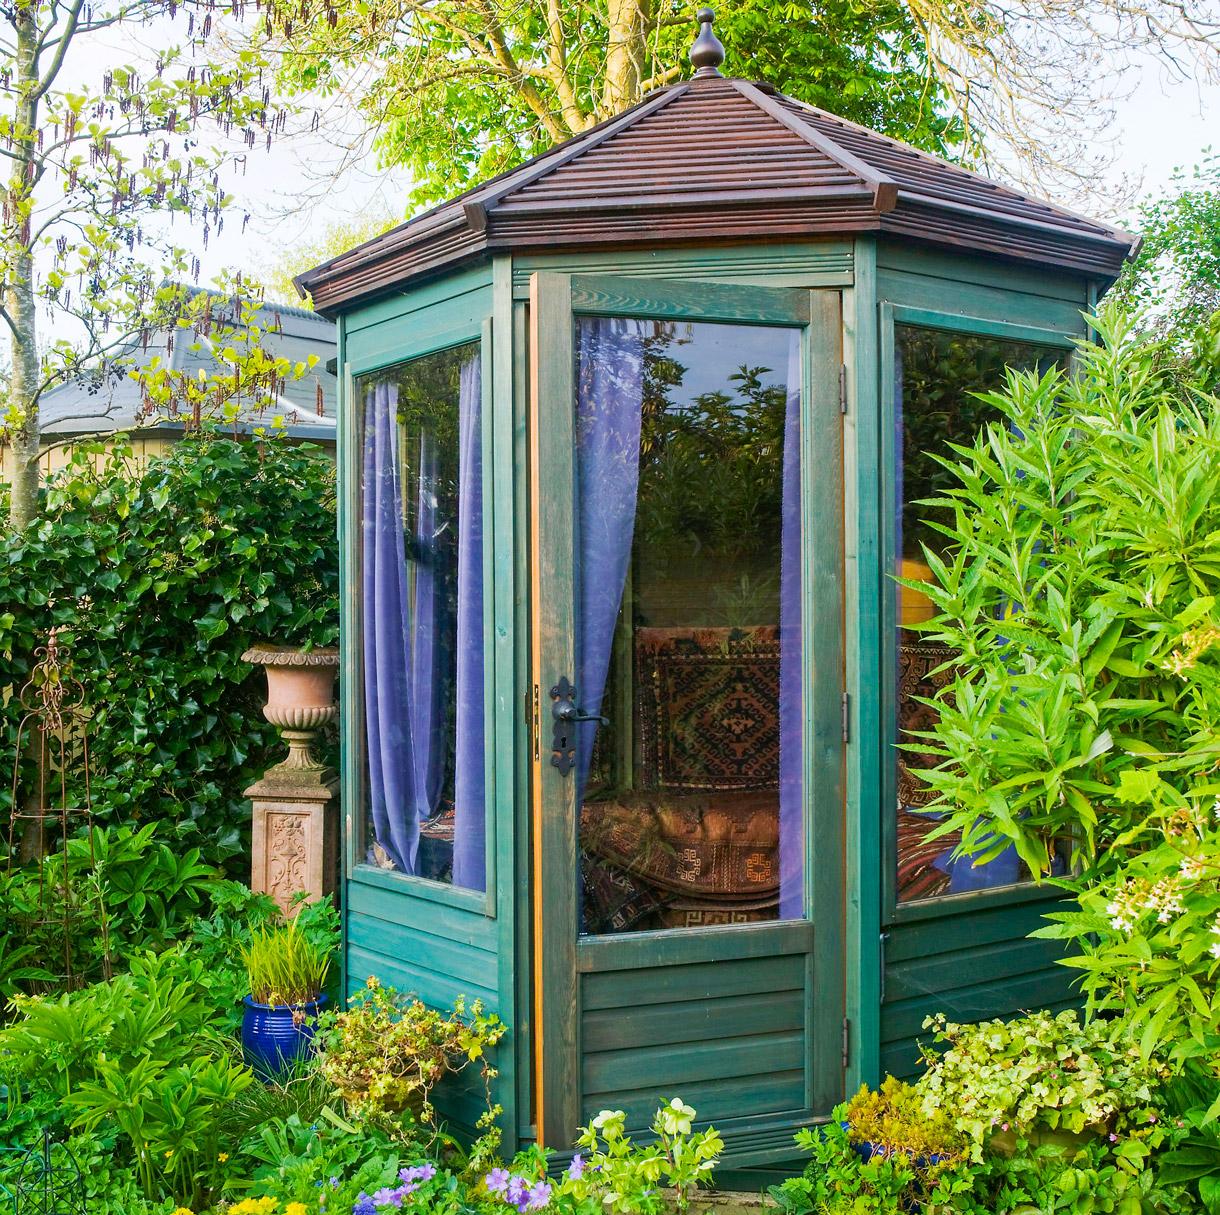 Kiosque Jardin, Kiosque En Bois Pour Jardin   Détente Jardin dedans Kiosque De Jardin En Bois Pas Cher